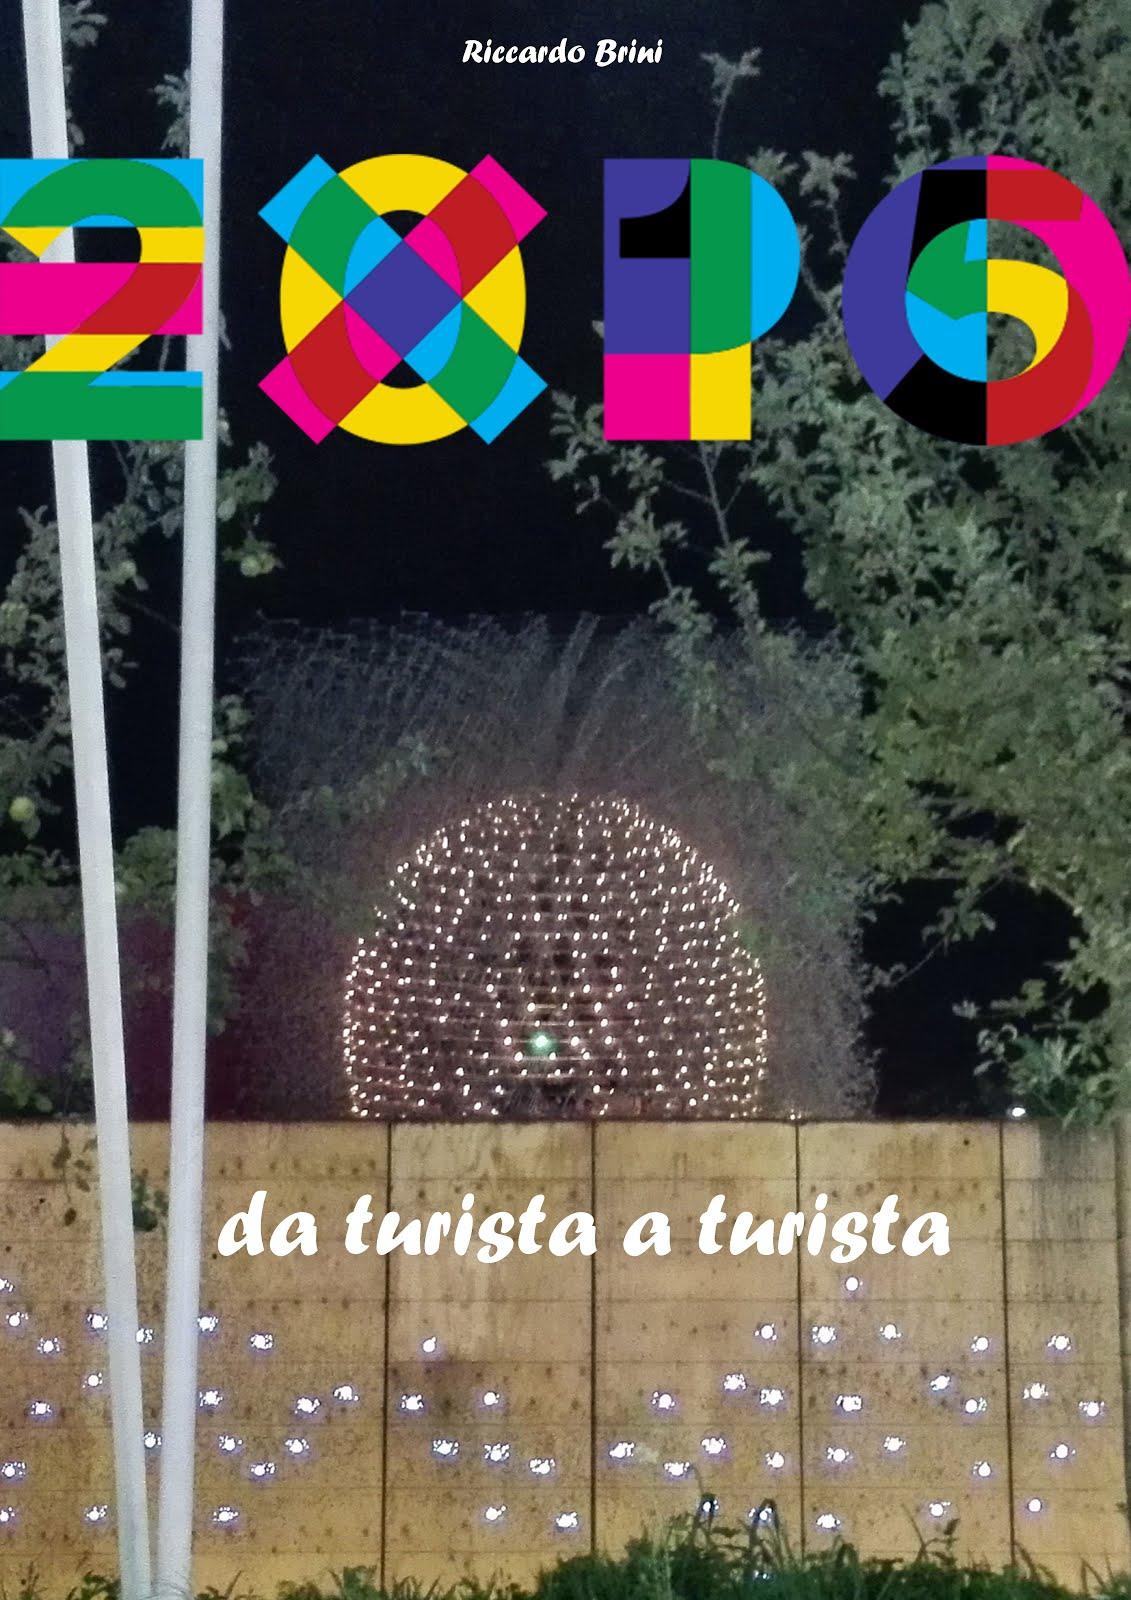 """EXPO 2015: da turista a turista"""